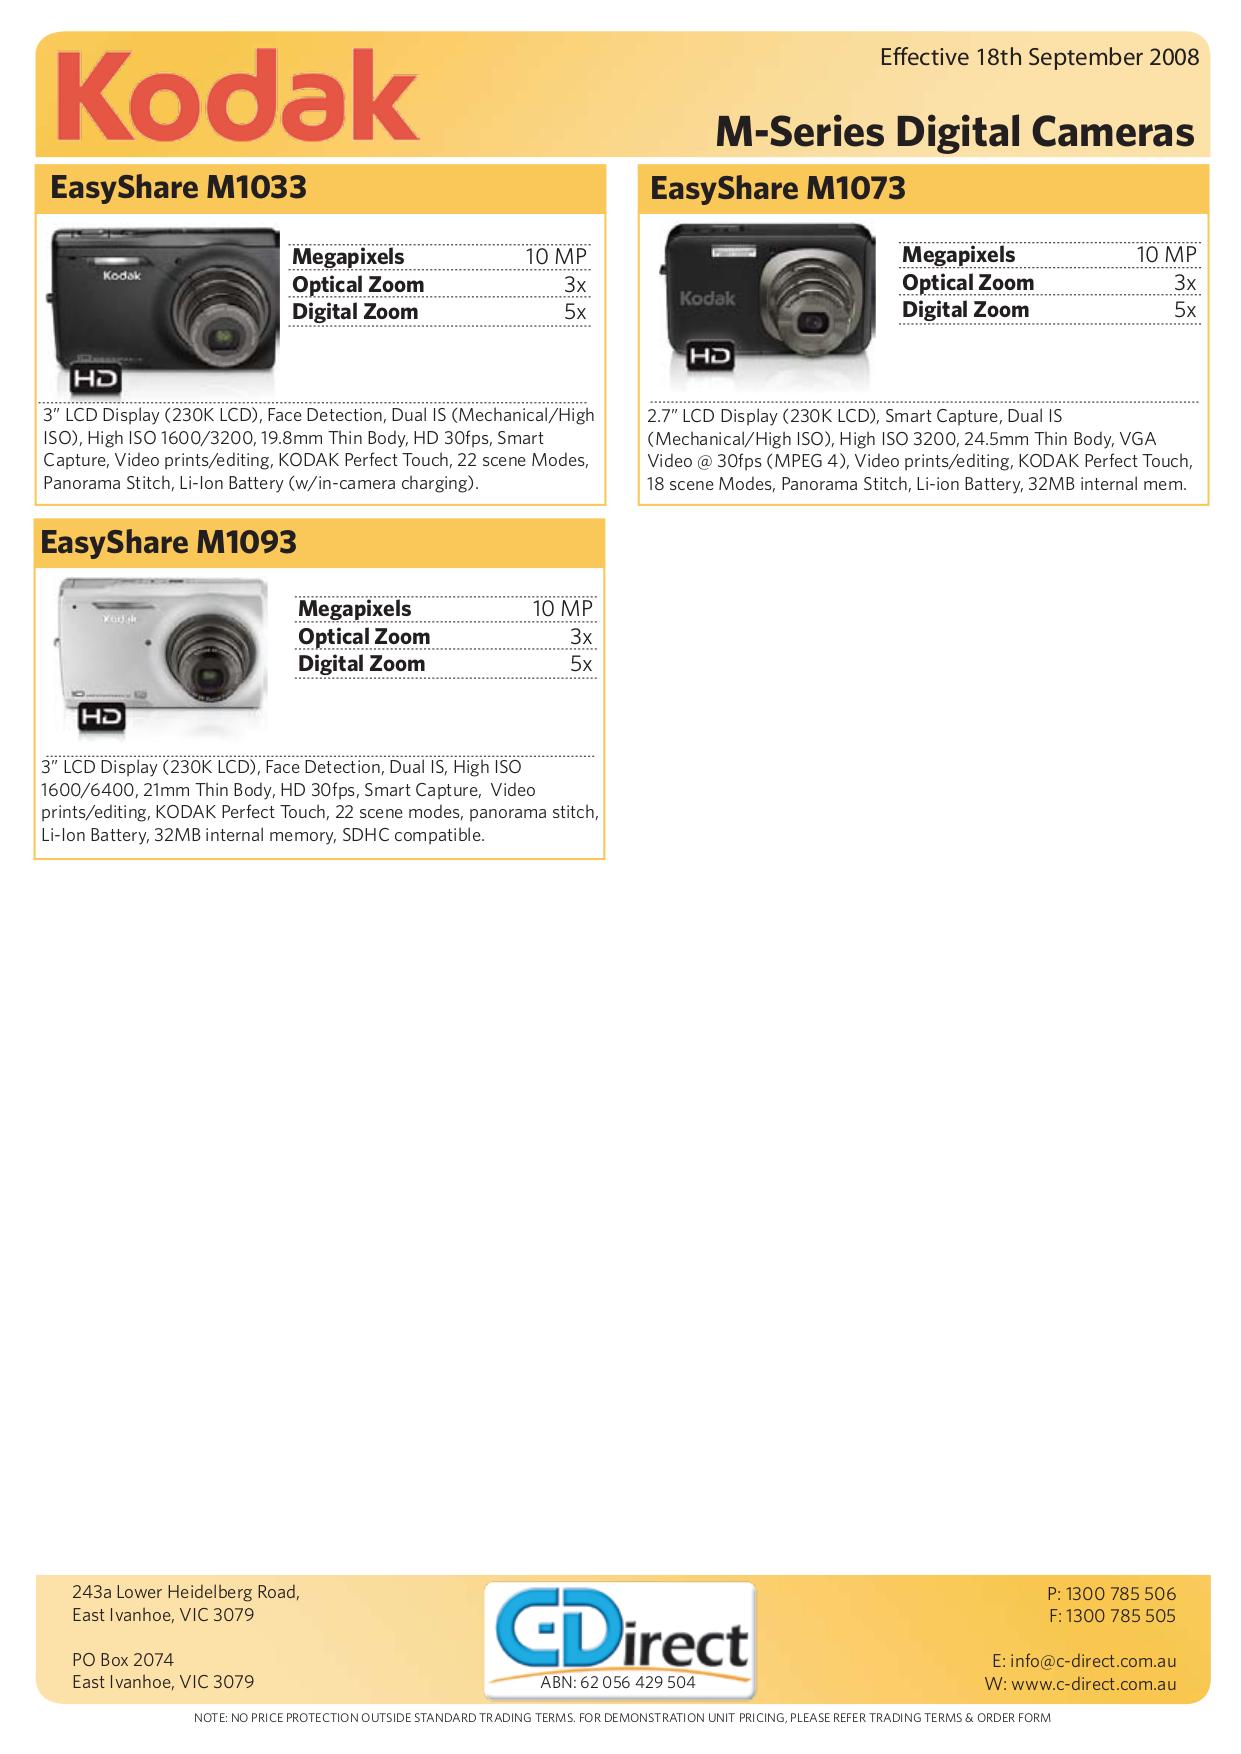 pdf for Kodak Digital Camera EasyShare M1073 IS manual